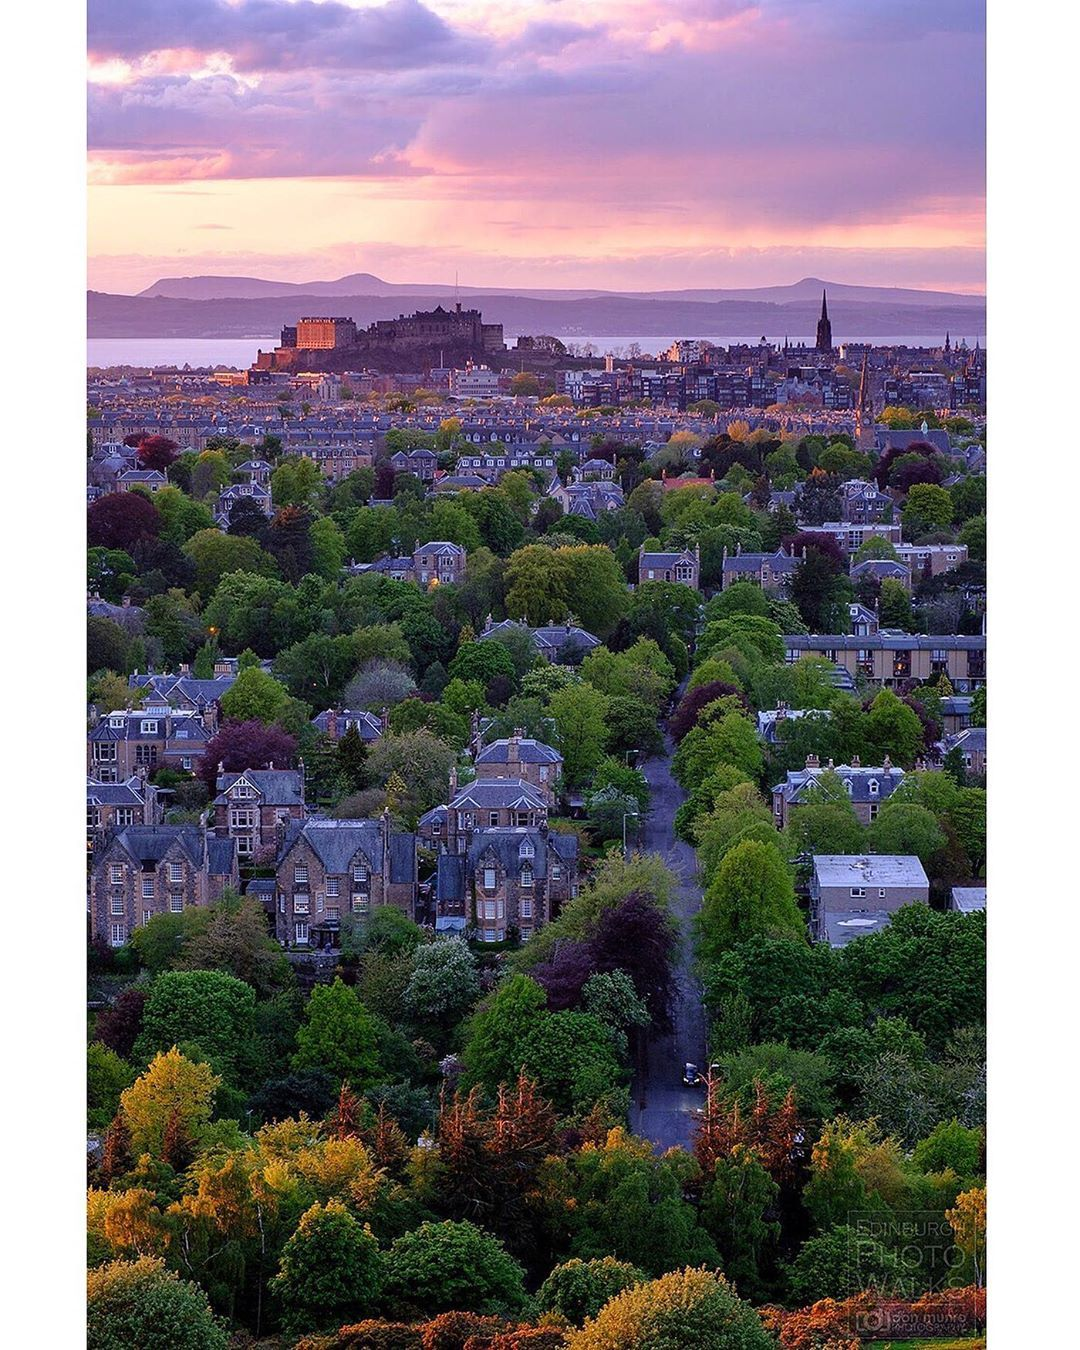 Blackford Hill views. 📷 @edinburghphotowalks . . . . . #Edinburgh #PhotoWalk #thisisedinburgh #BrilliantMoments #EdinPhoto #EdinburghLife…